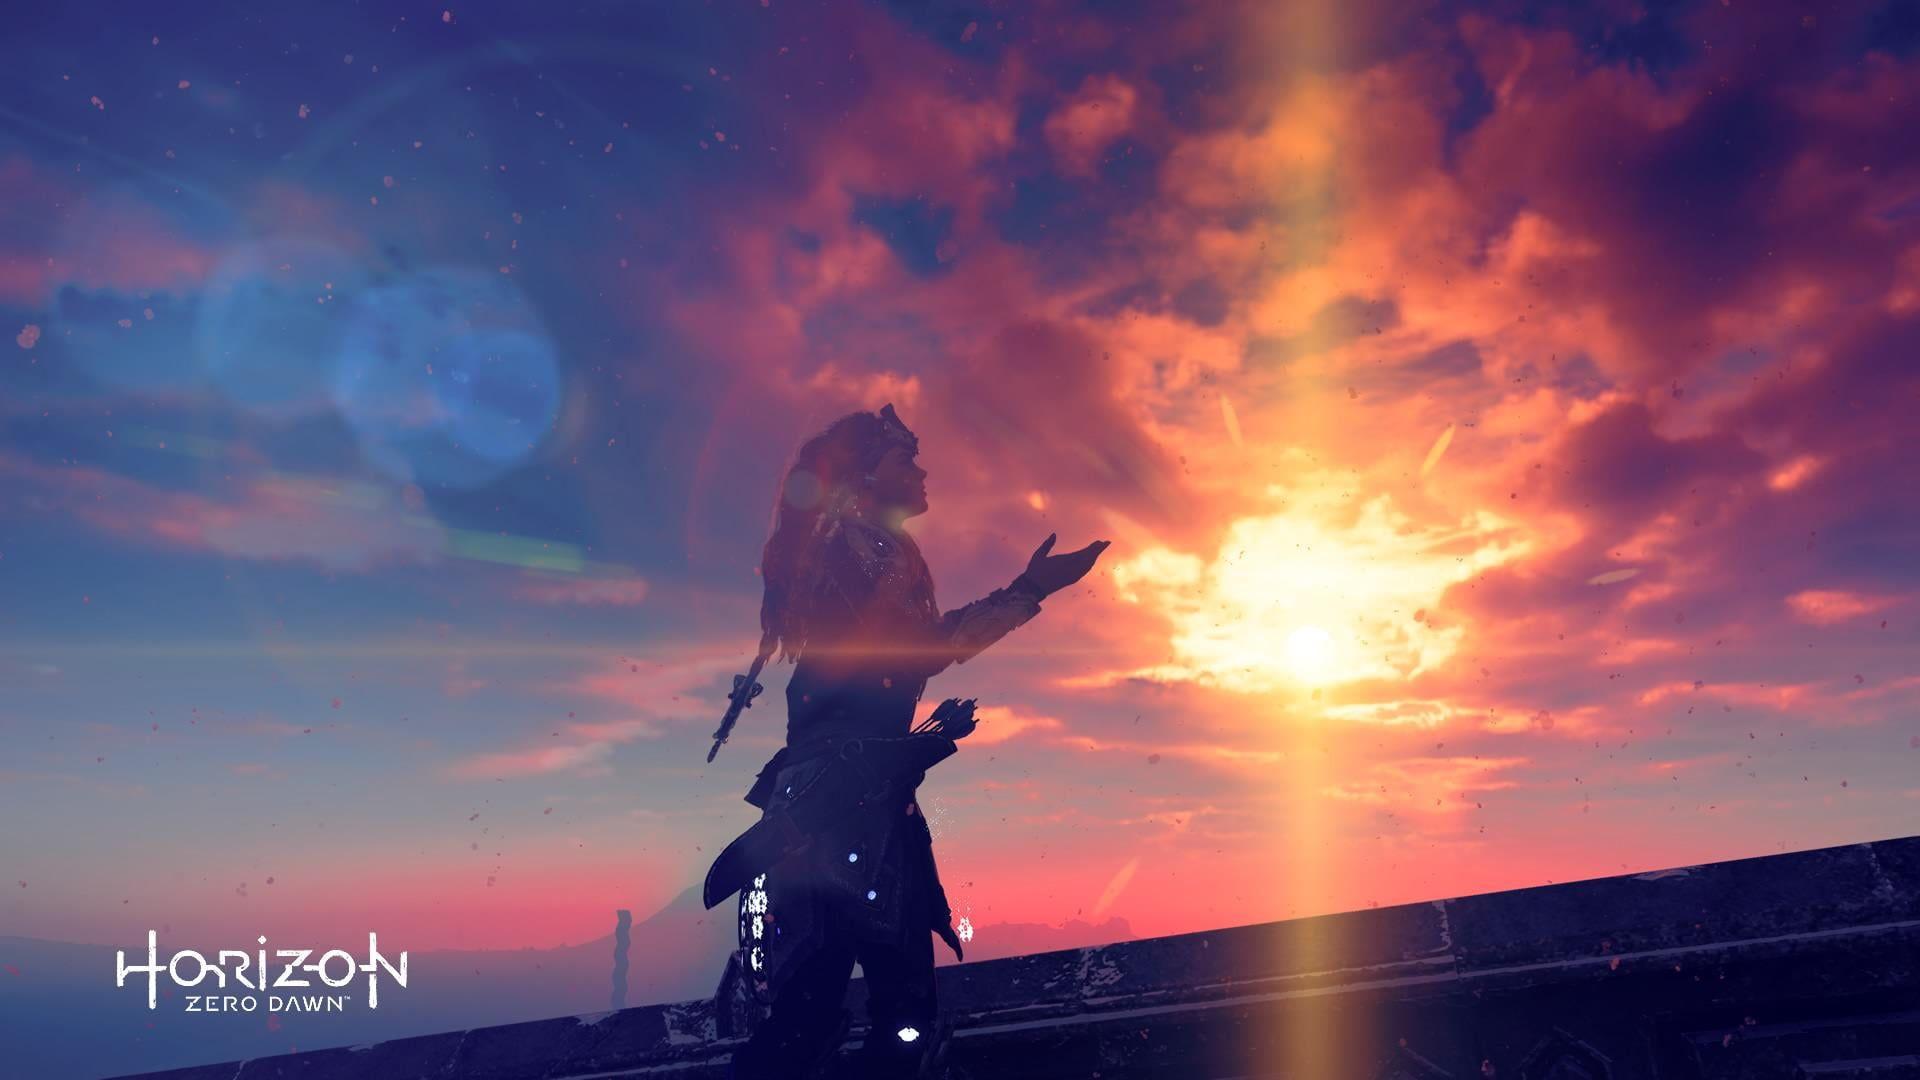 HD wallpaper: Horizon Zero Dawn digital wallpaper, Horizon: Zero Dawn, PlayStation 4